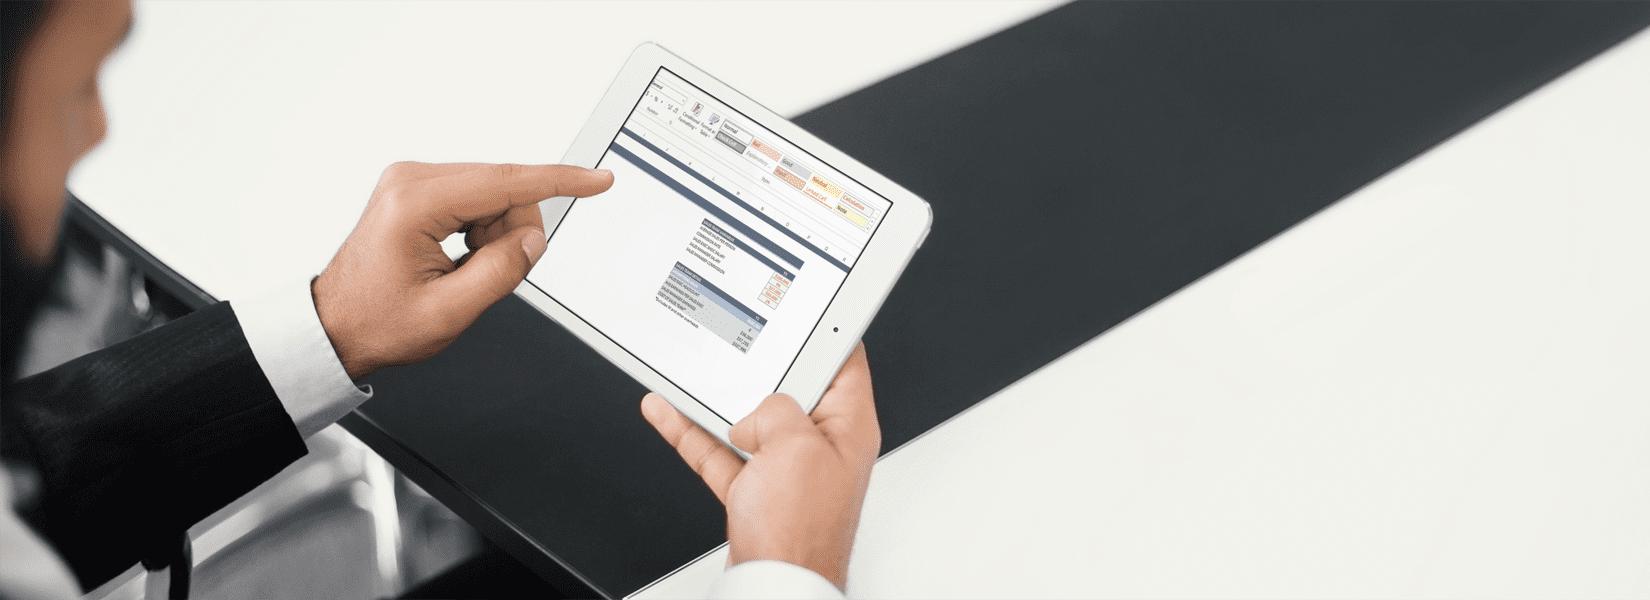 Business plan reviews by Platform Executive